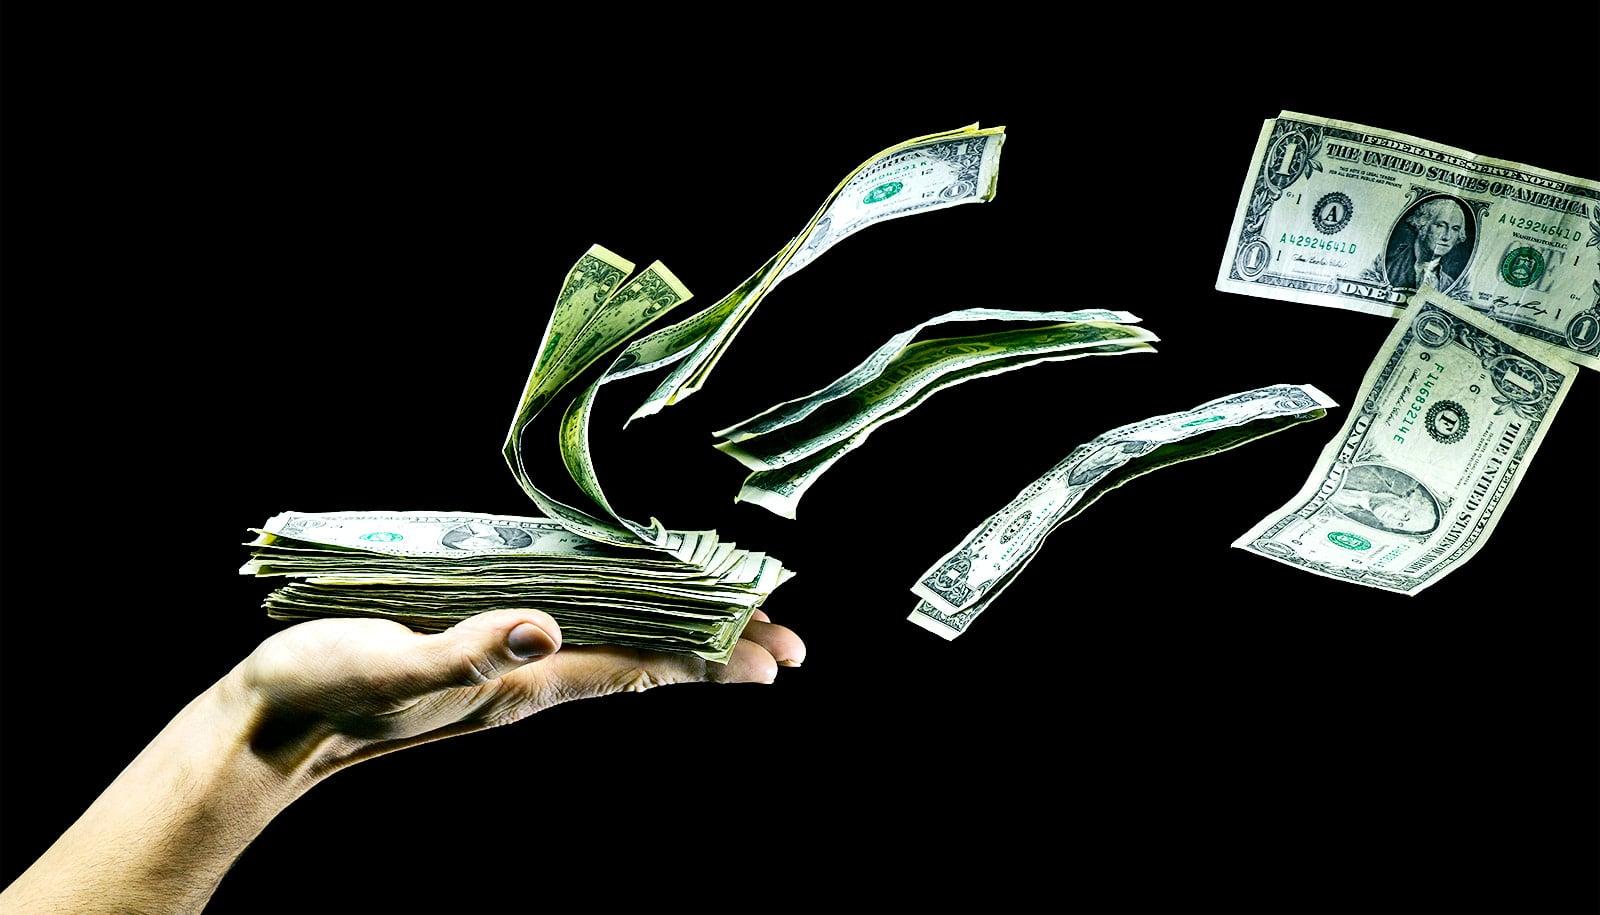 Health insurance 'sludge' costs US economy billions of dollars - Futurity